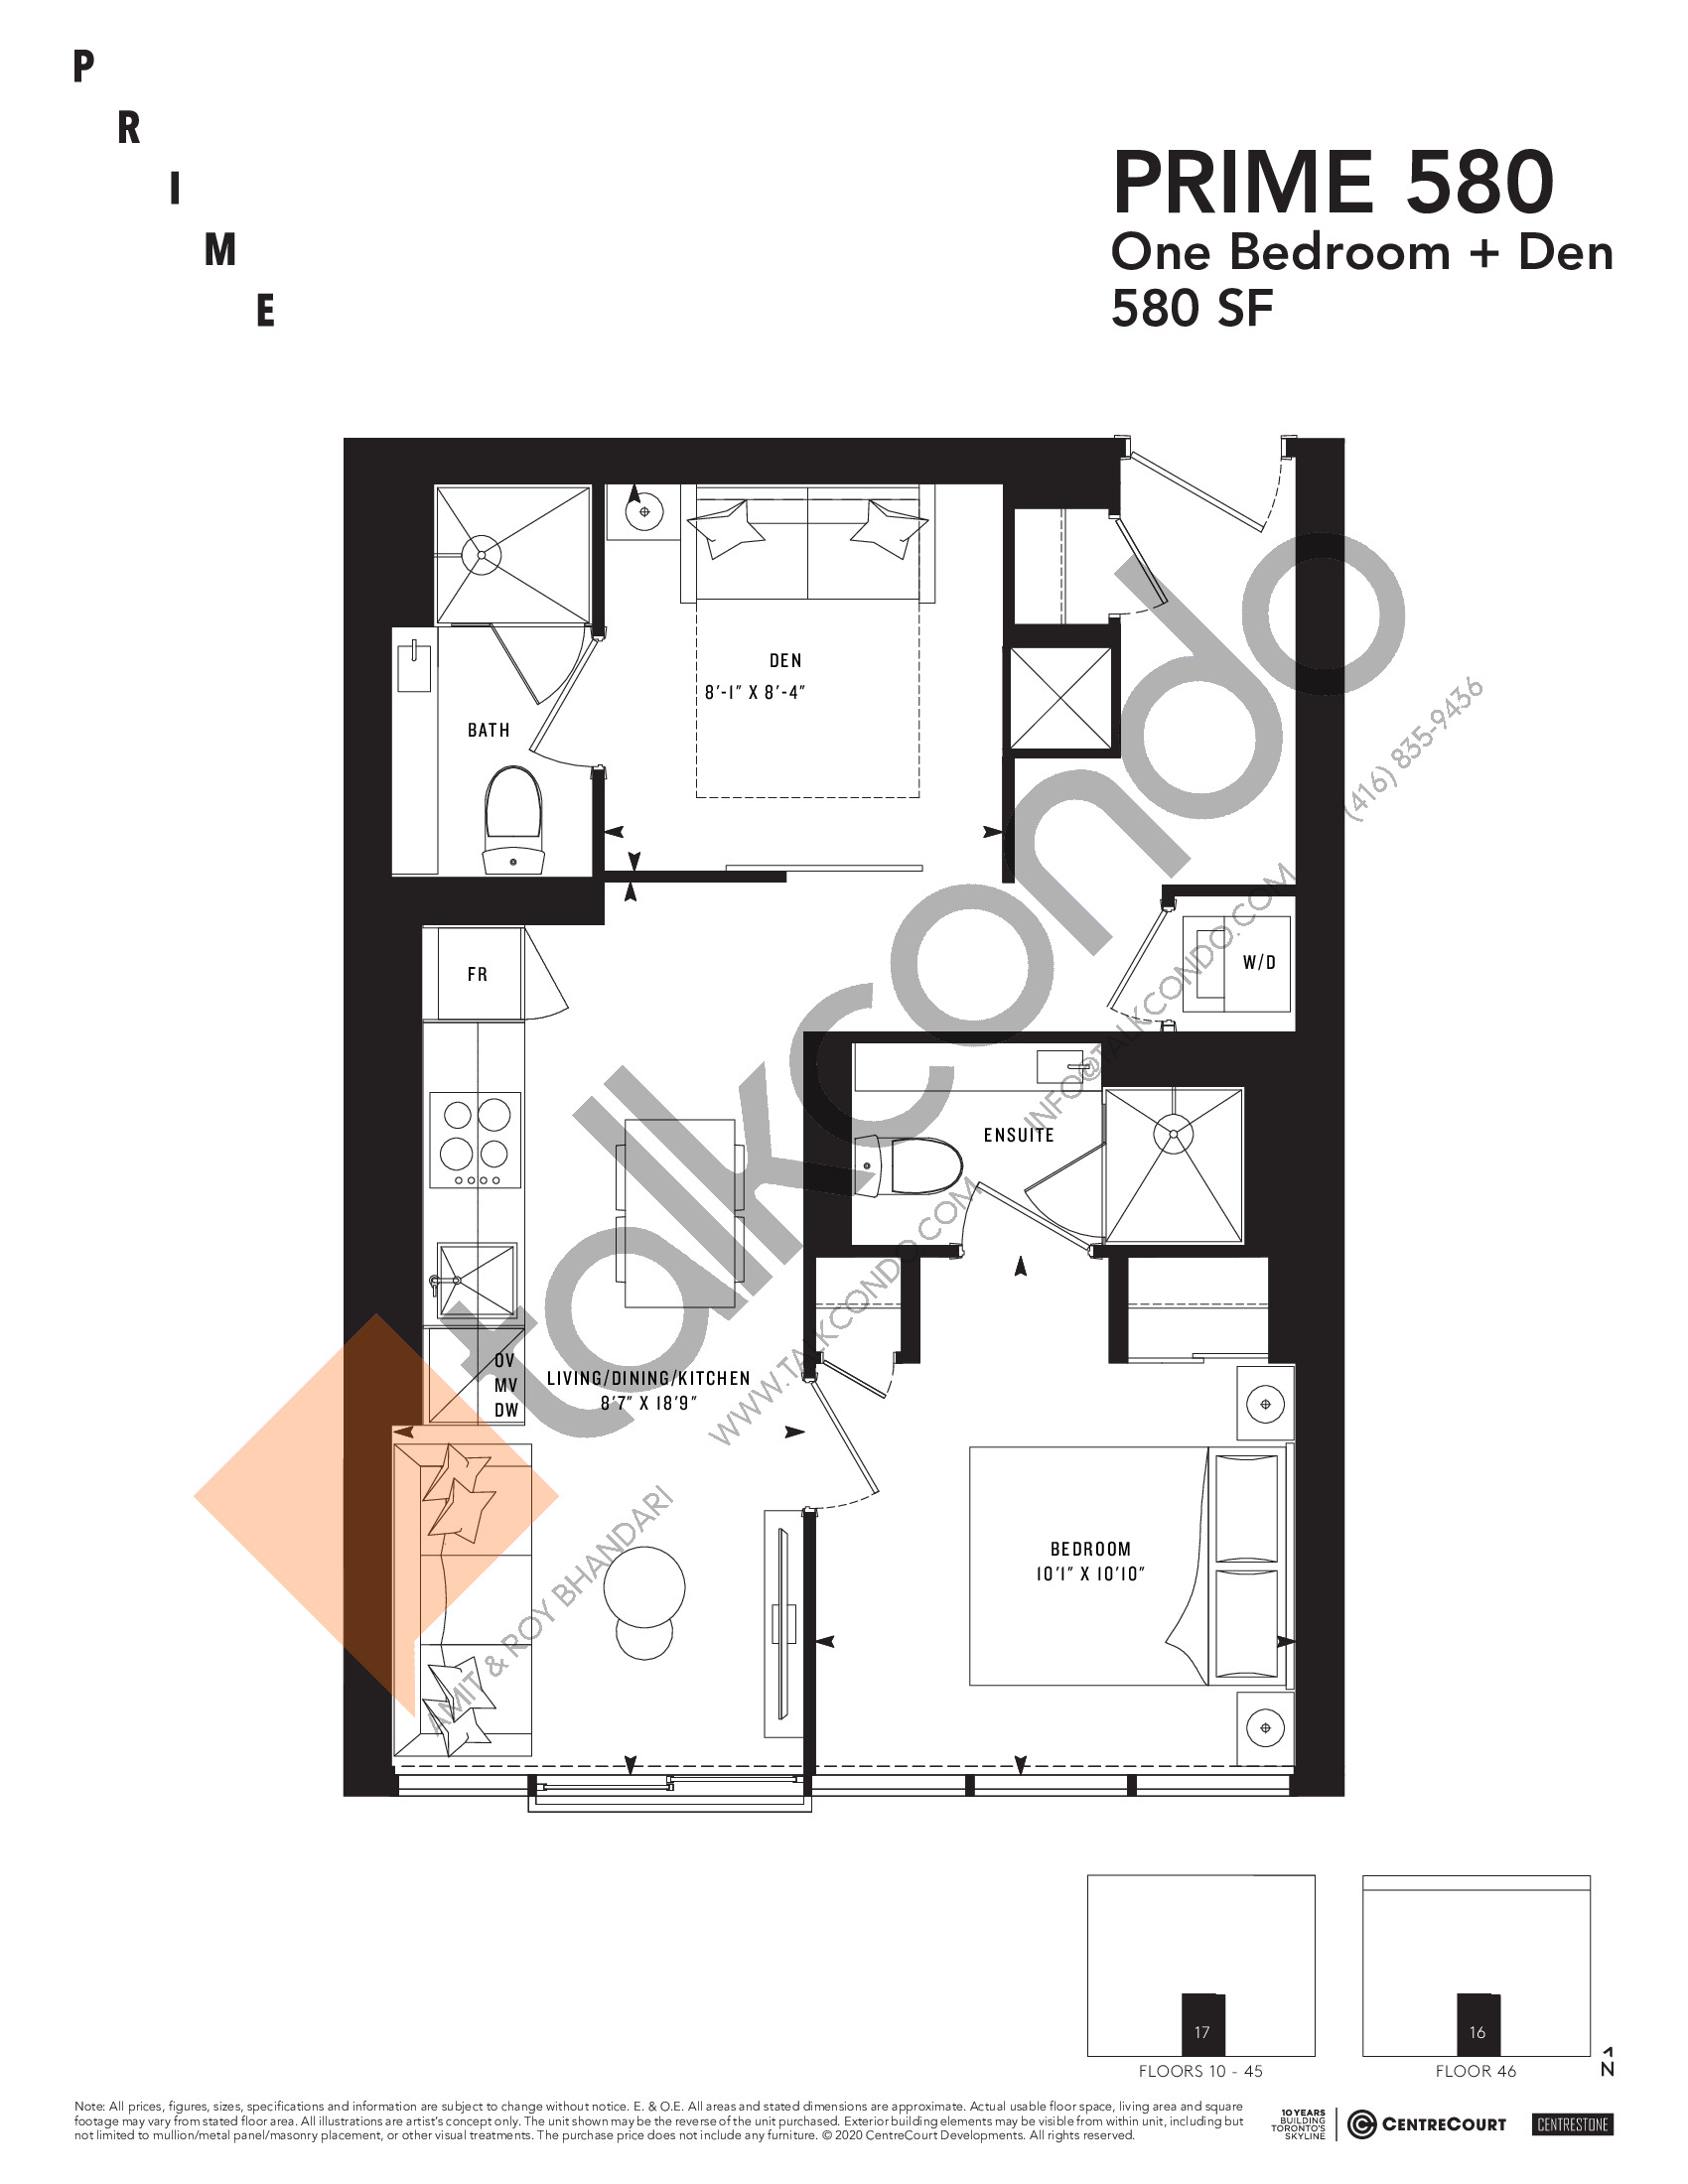 PRIME 580 Floor Plan at Prime Condos - 580 sq.ft